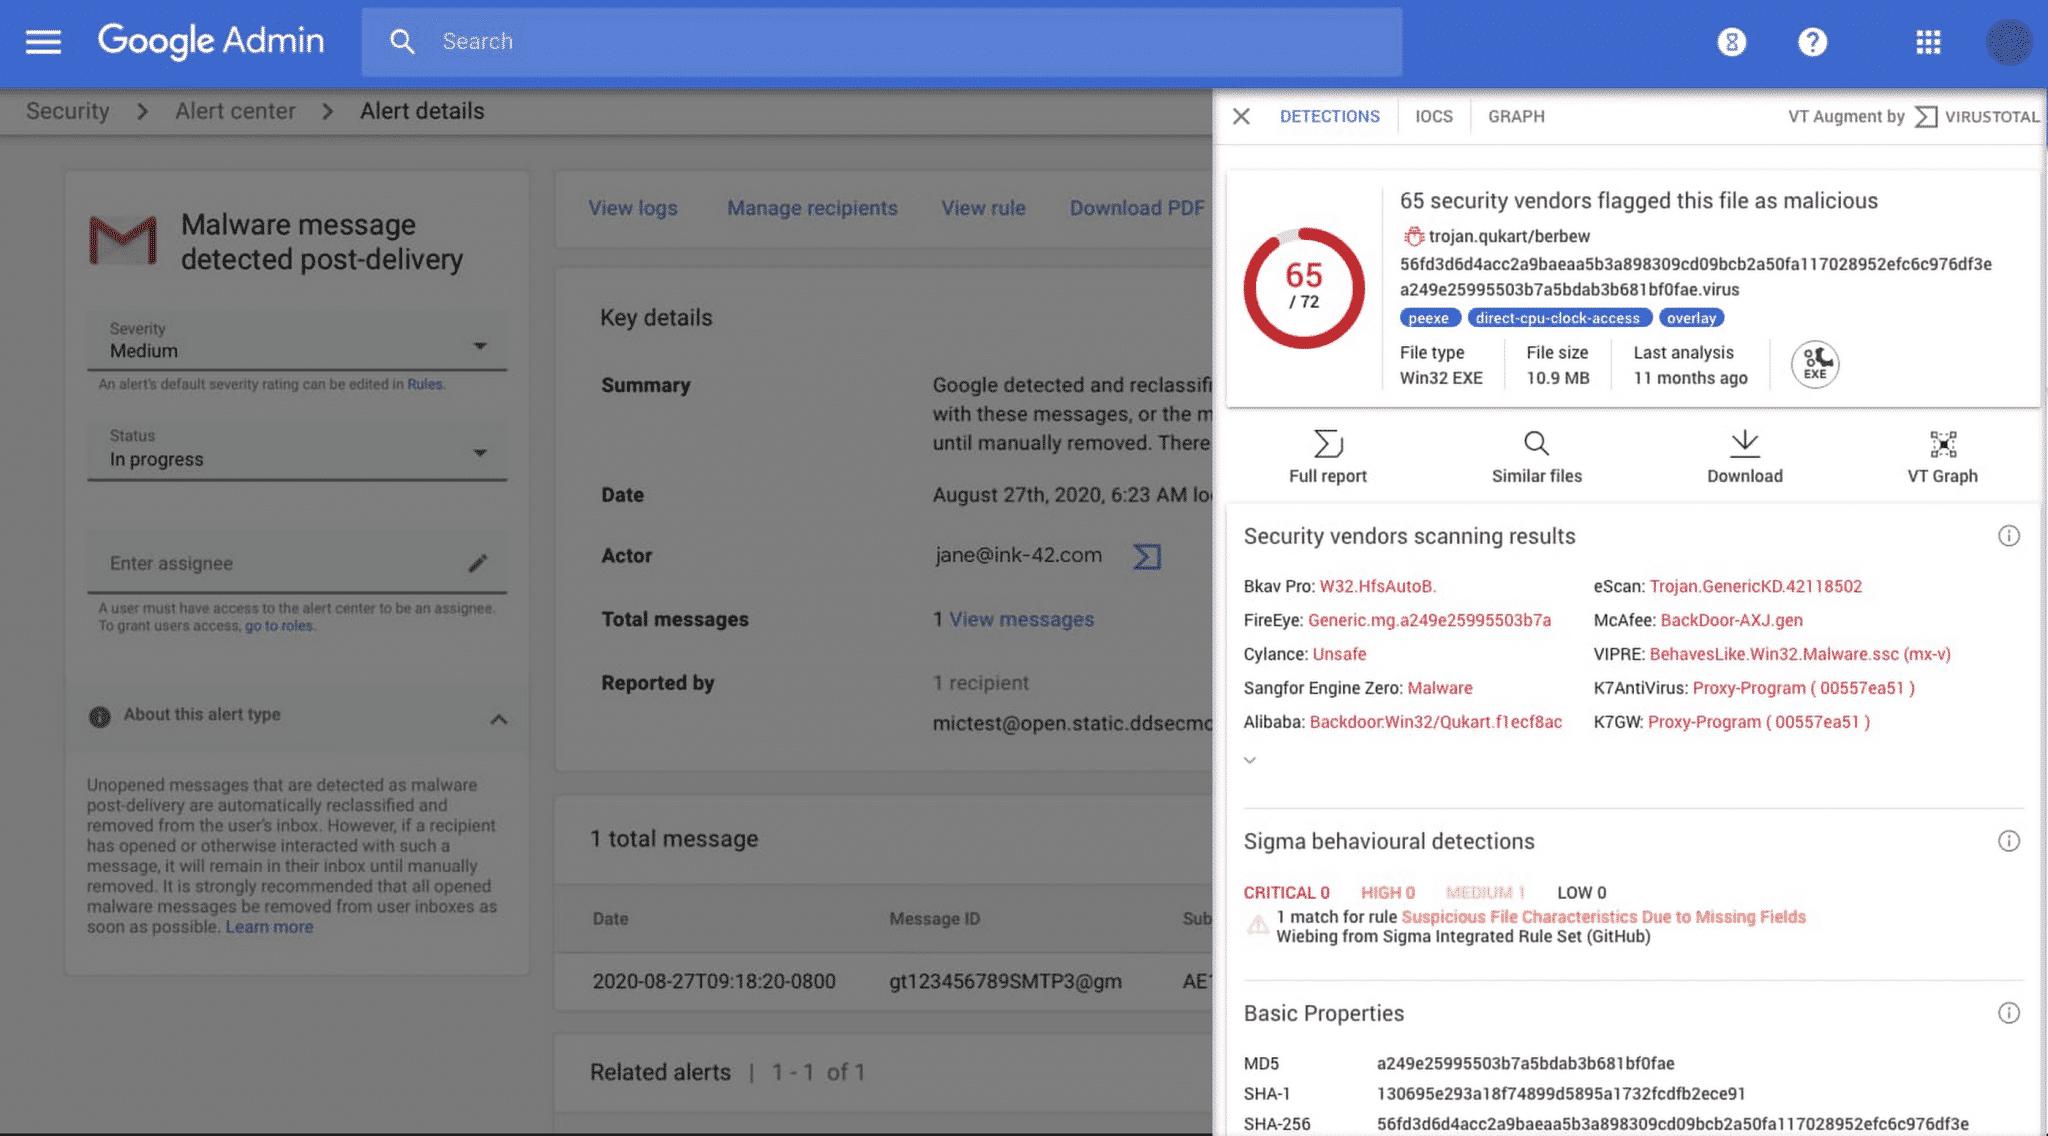 Google Workspace VirusTotal